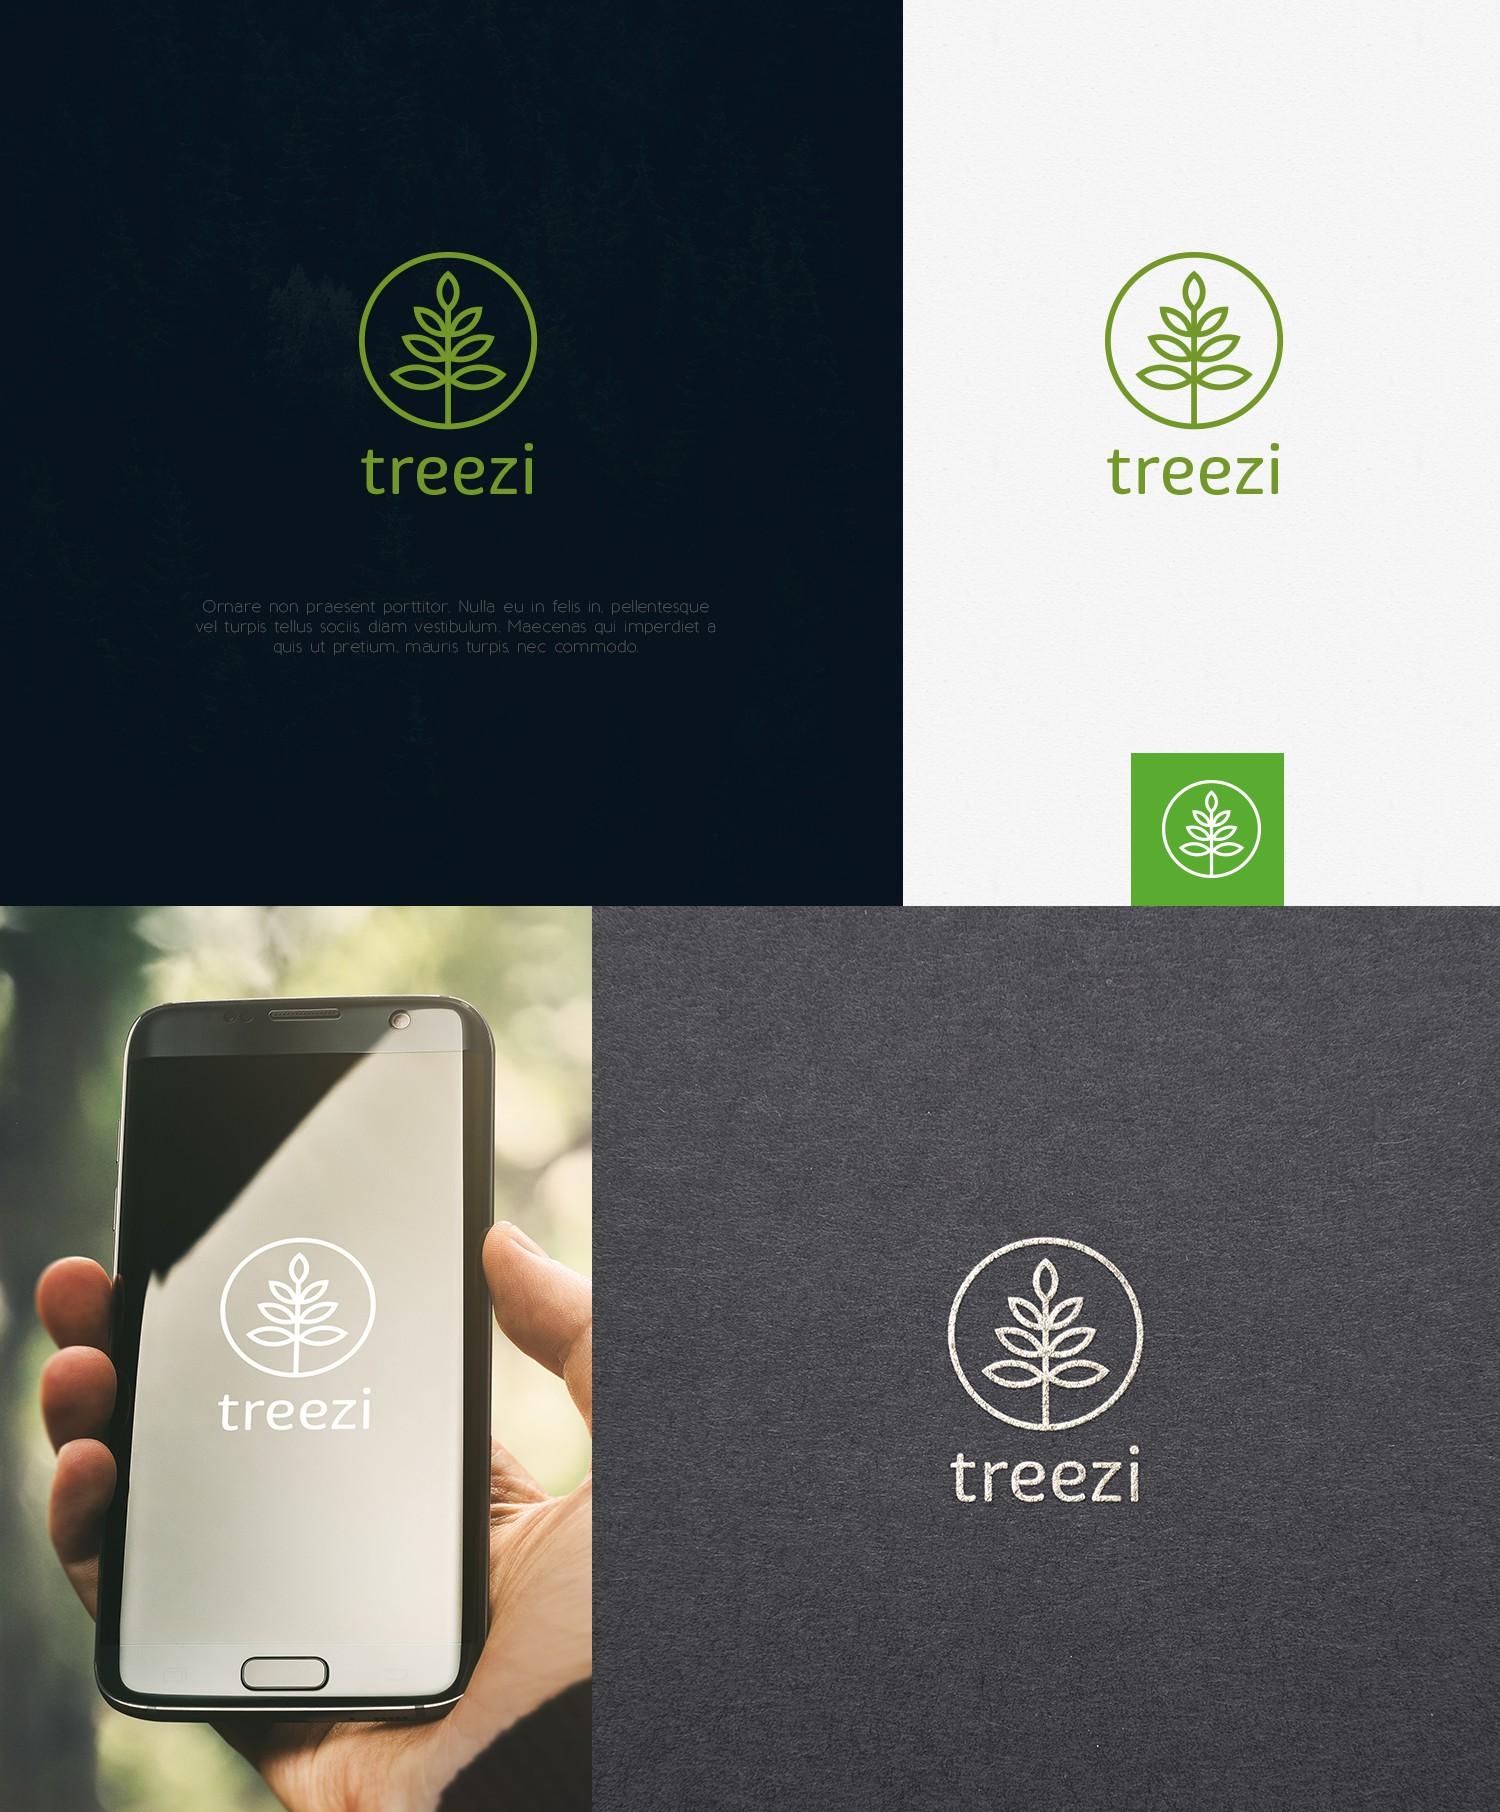 Design a logo for treezi, an app for tree care companies